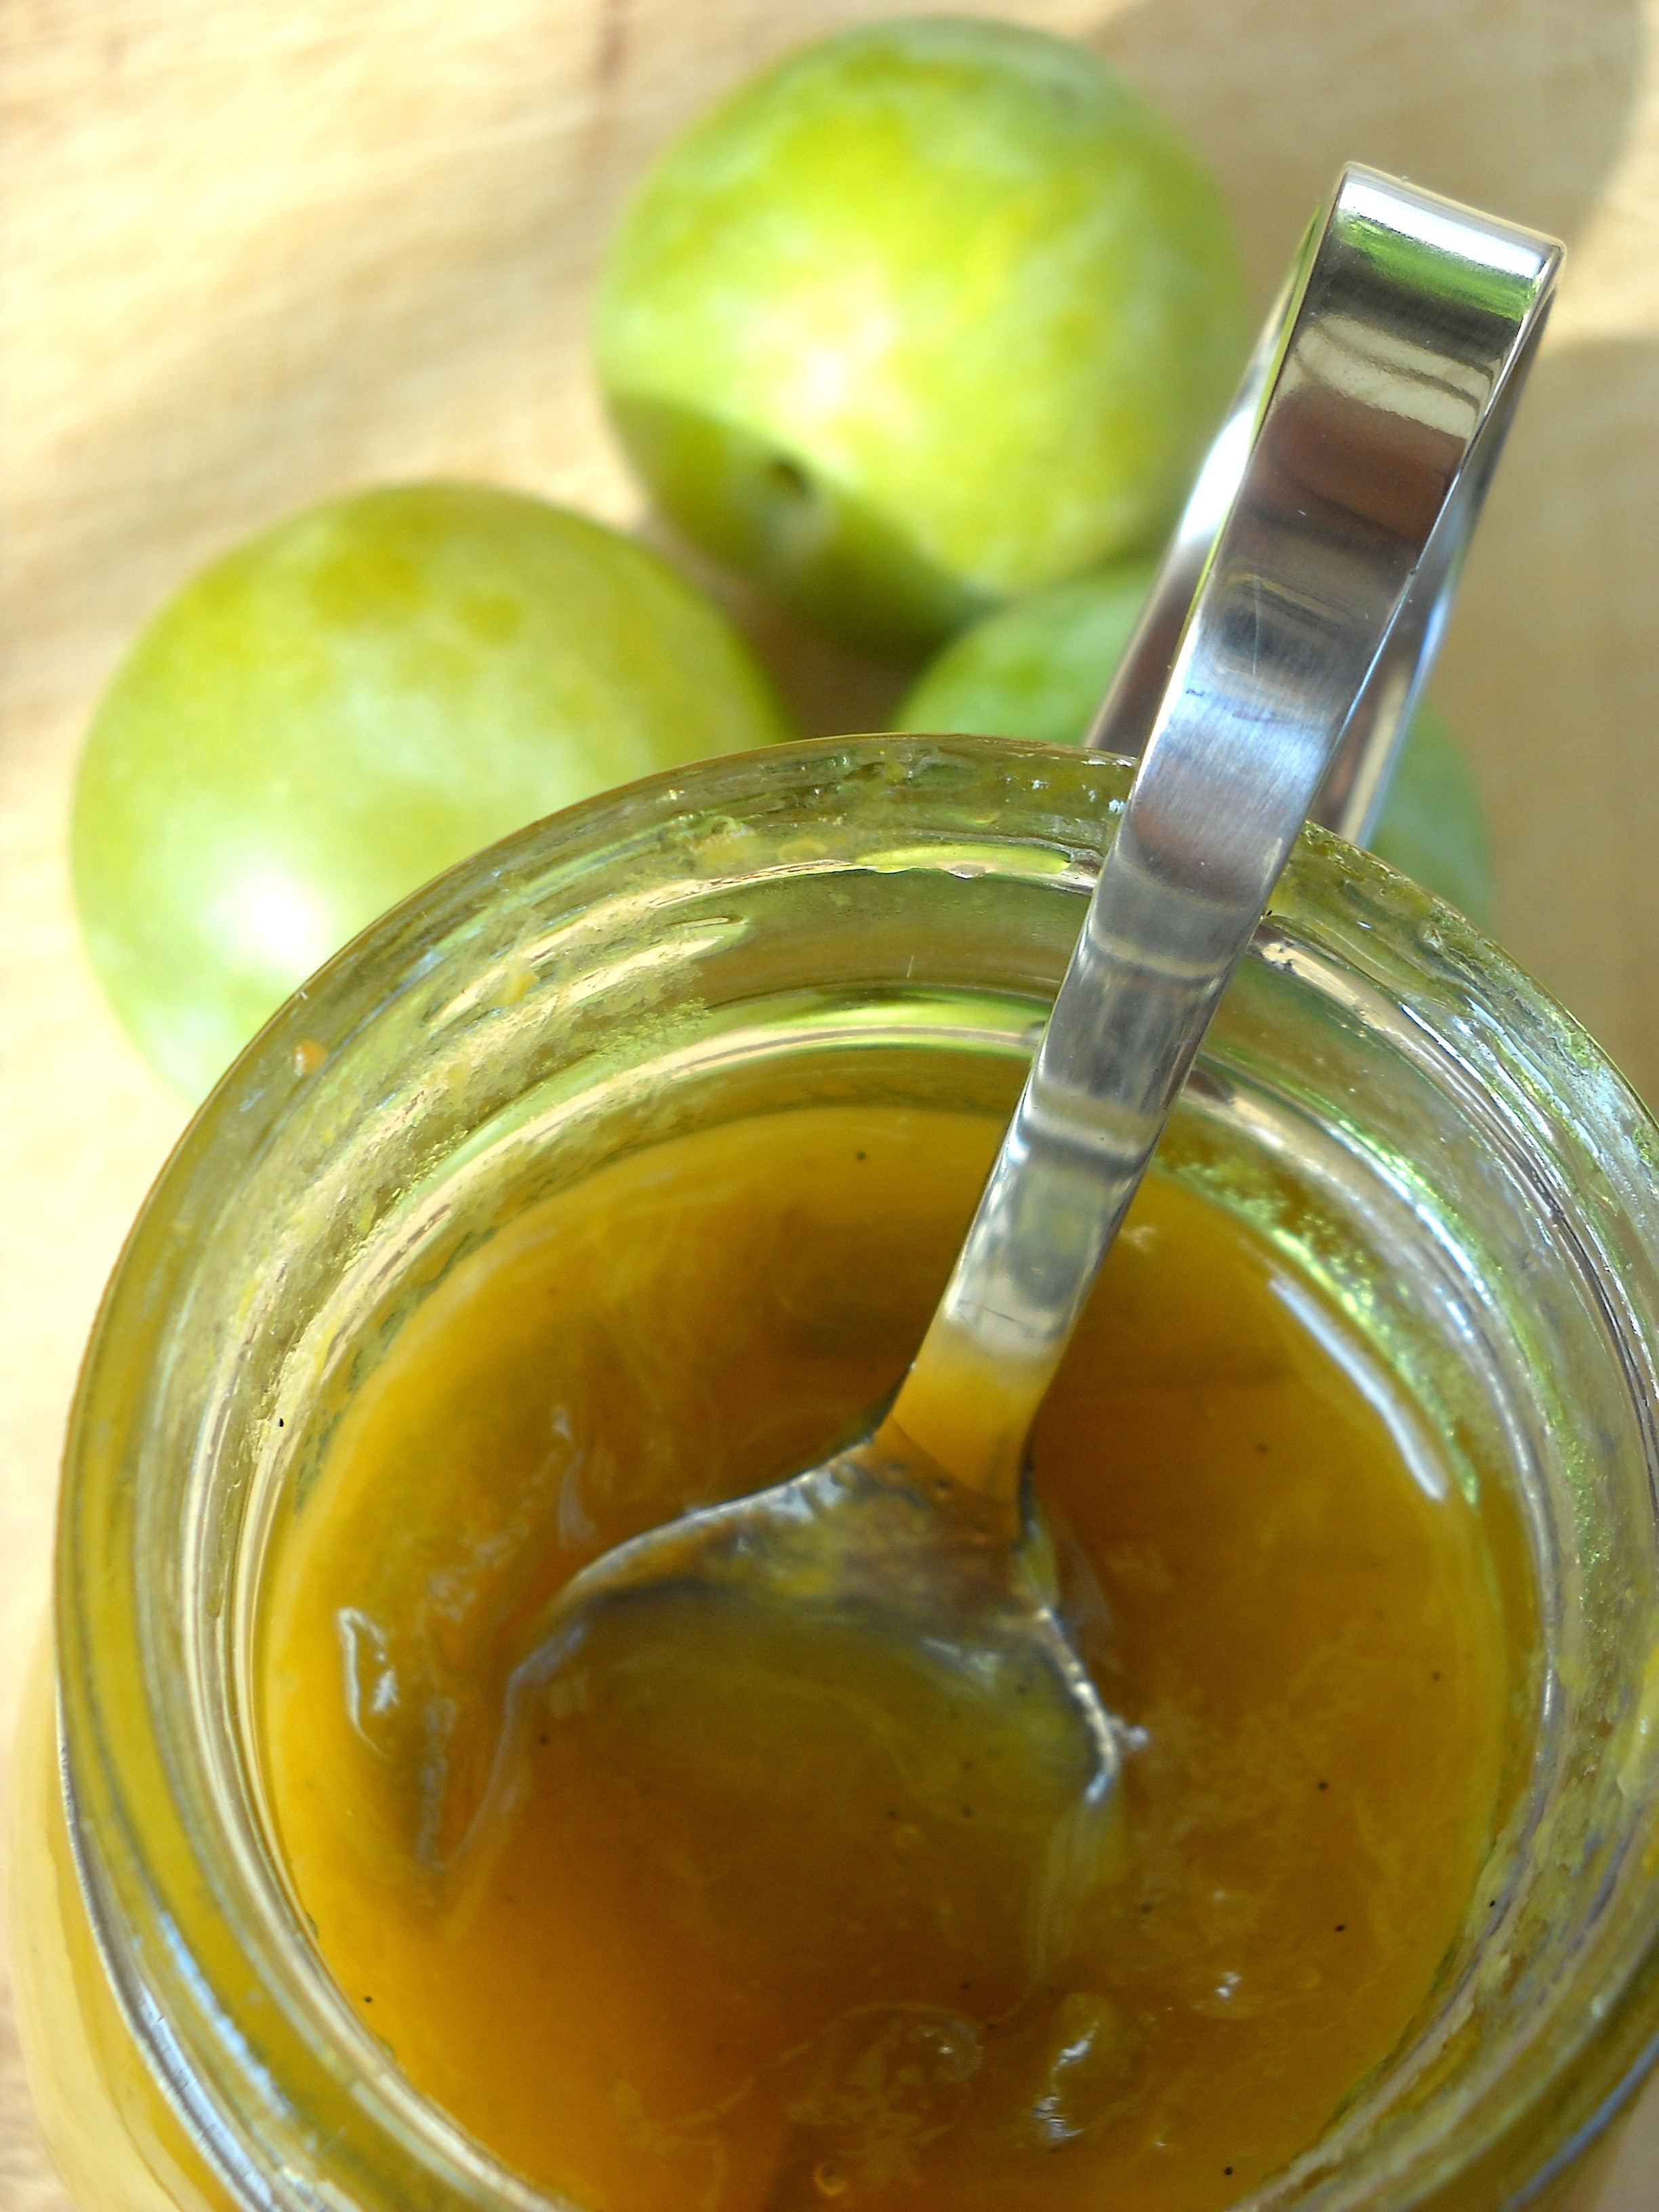 Greengage Jelly And Greengage Jam Recipe — Dishmaps